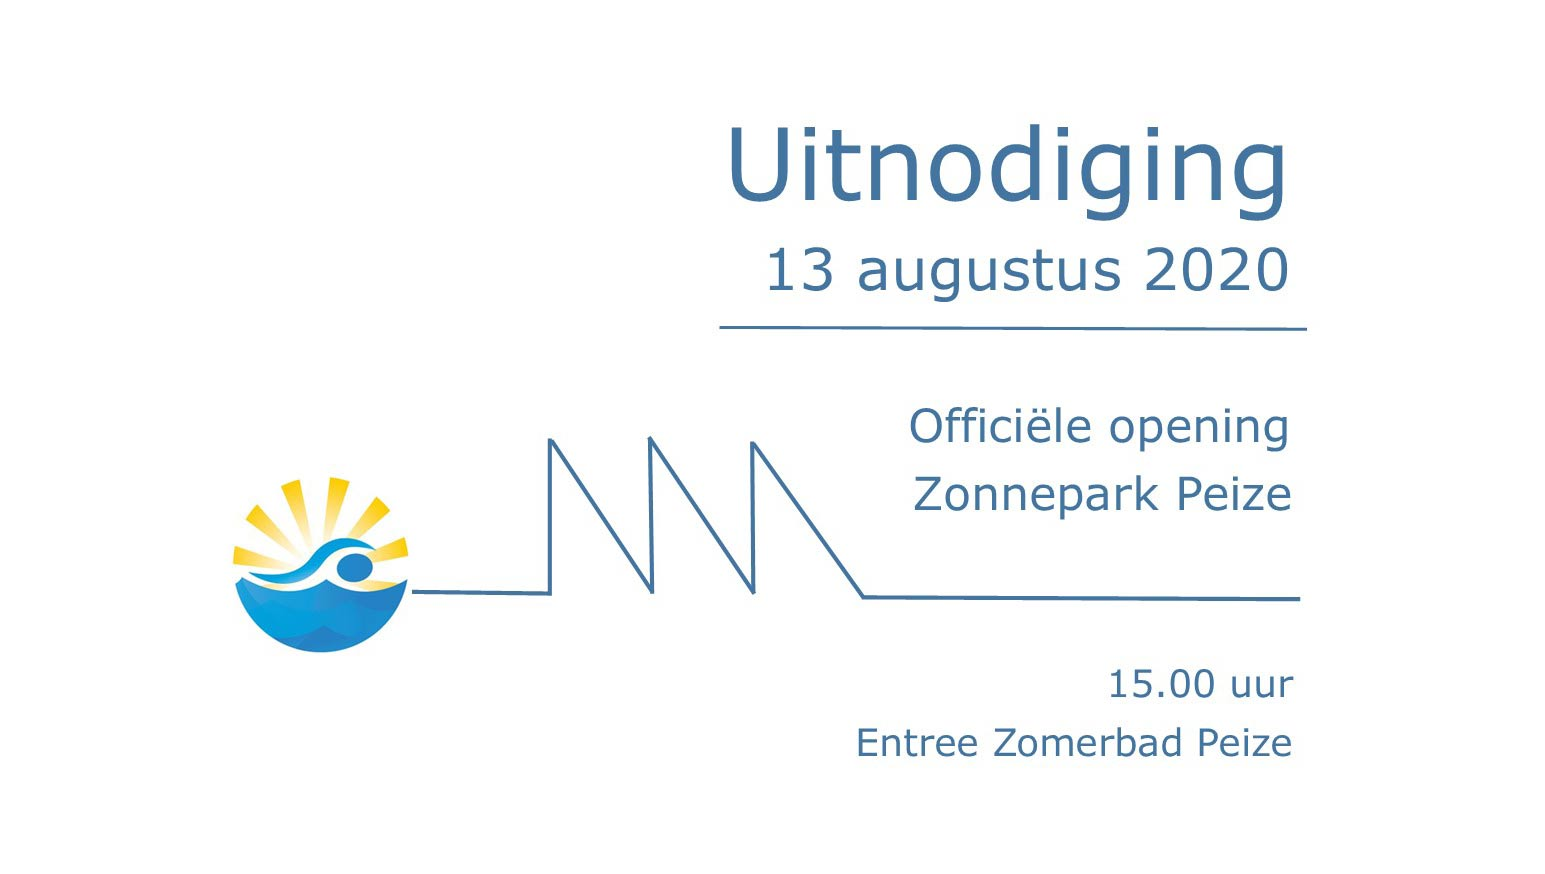 uitnodiging opening zonnepark zomerbad peize